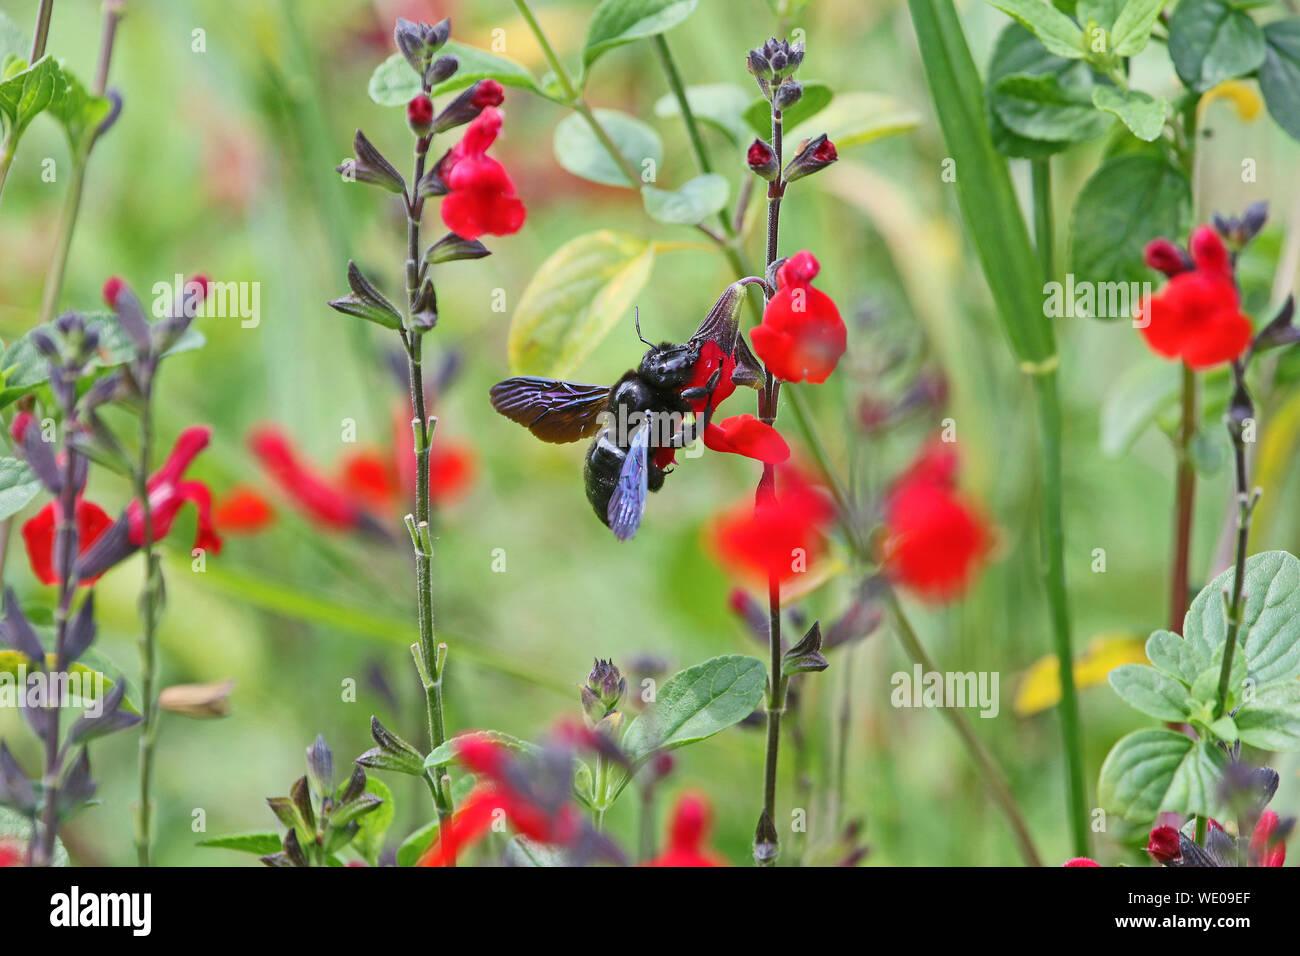 Carpenter bee Latin name xylocopa violacea feeding on scarlet flowering sage royal bumble or salvia x jamensis close up blooming in Italy in springtim Stock Photo